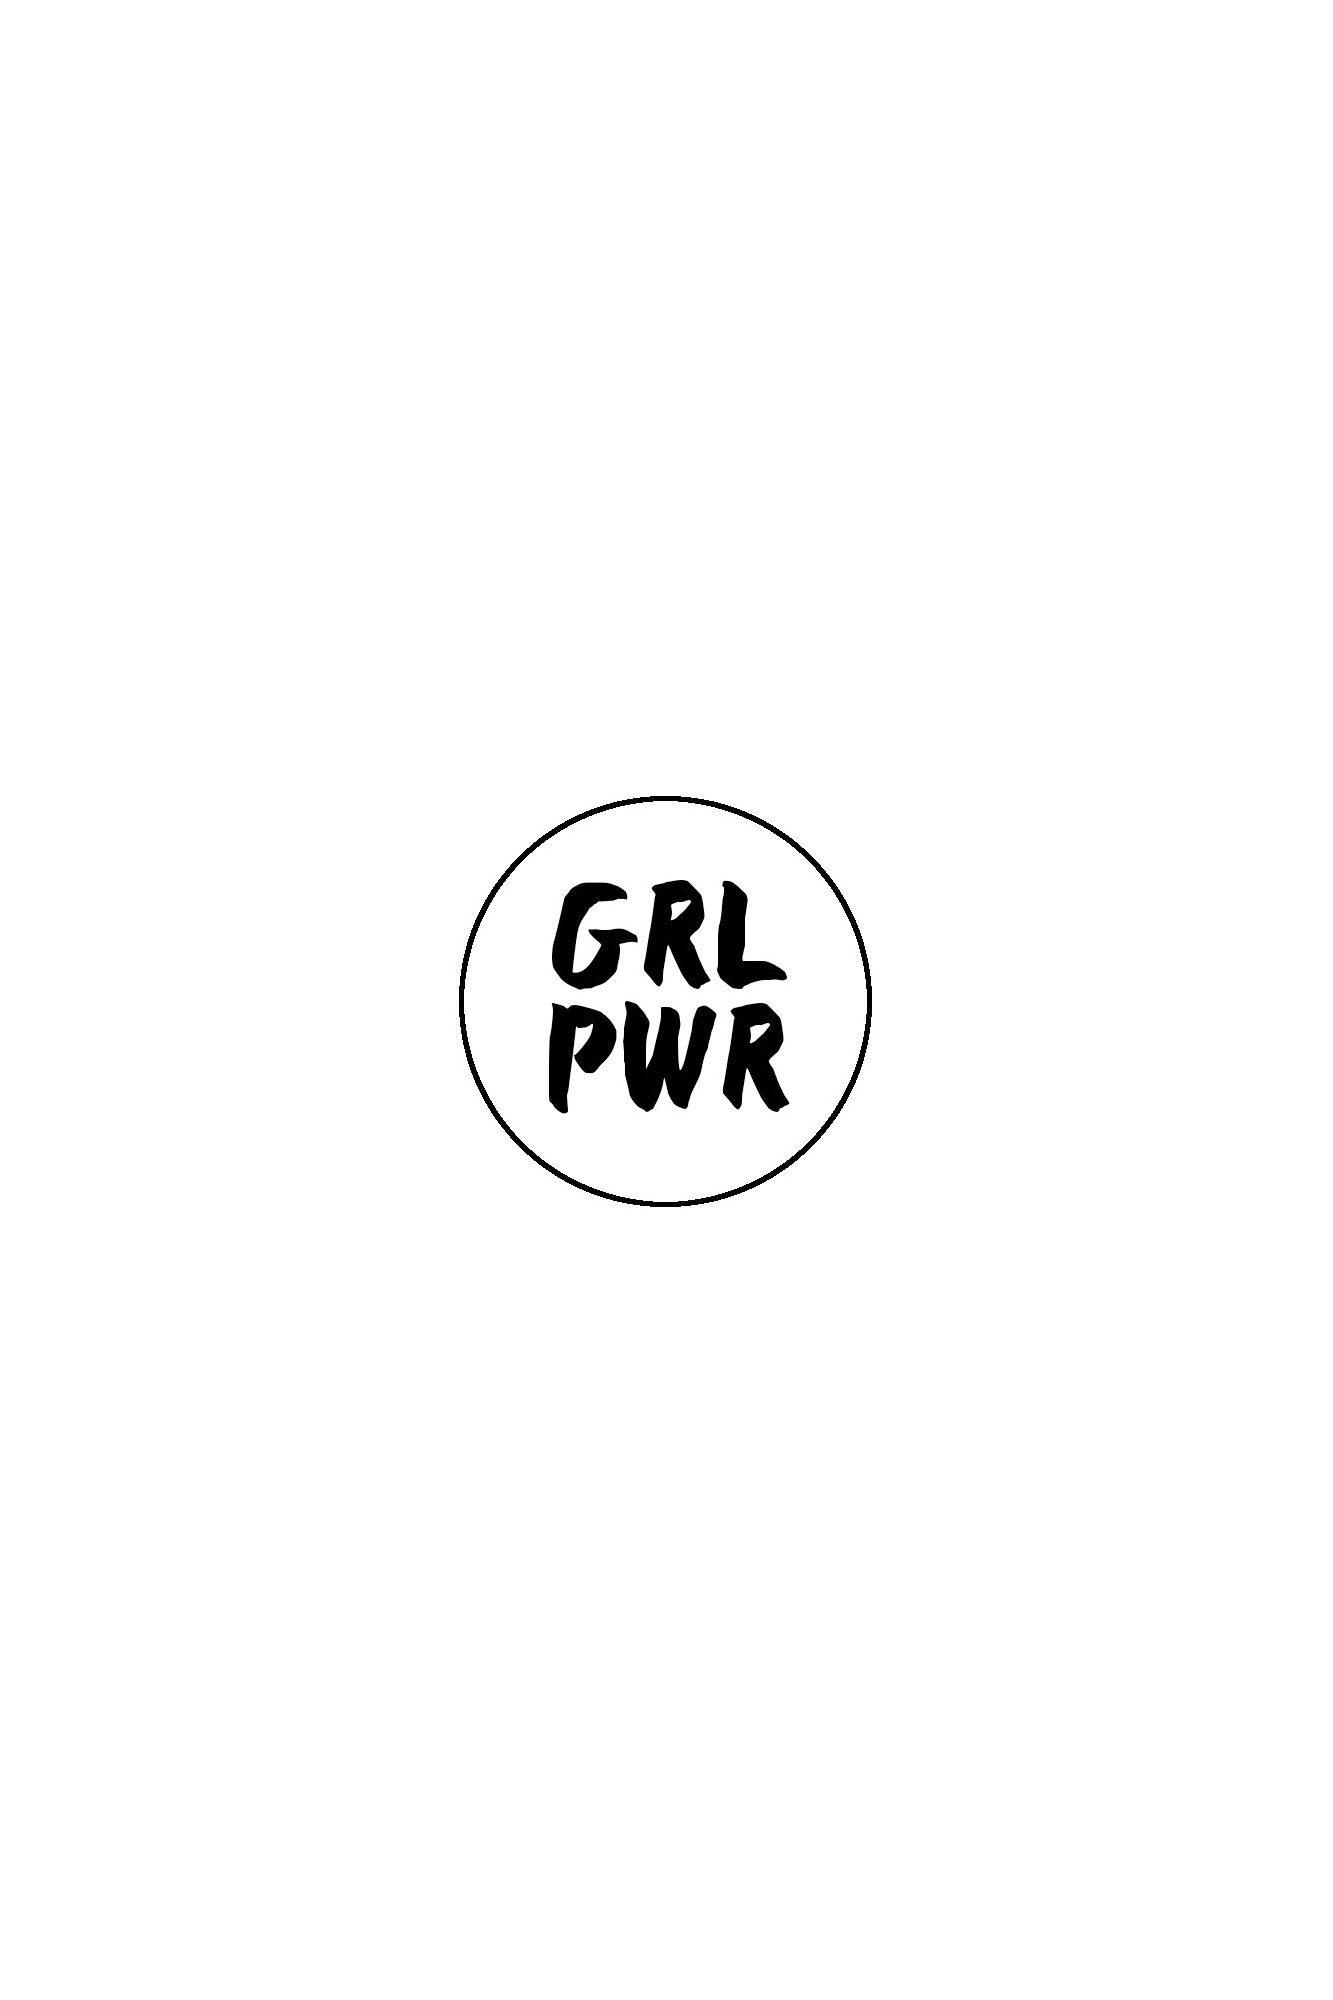 GRL PWR Badge